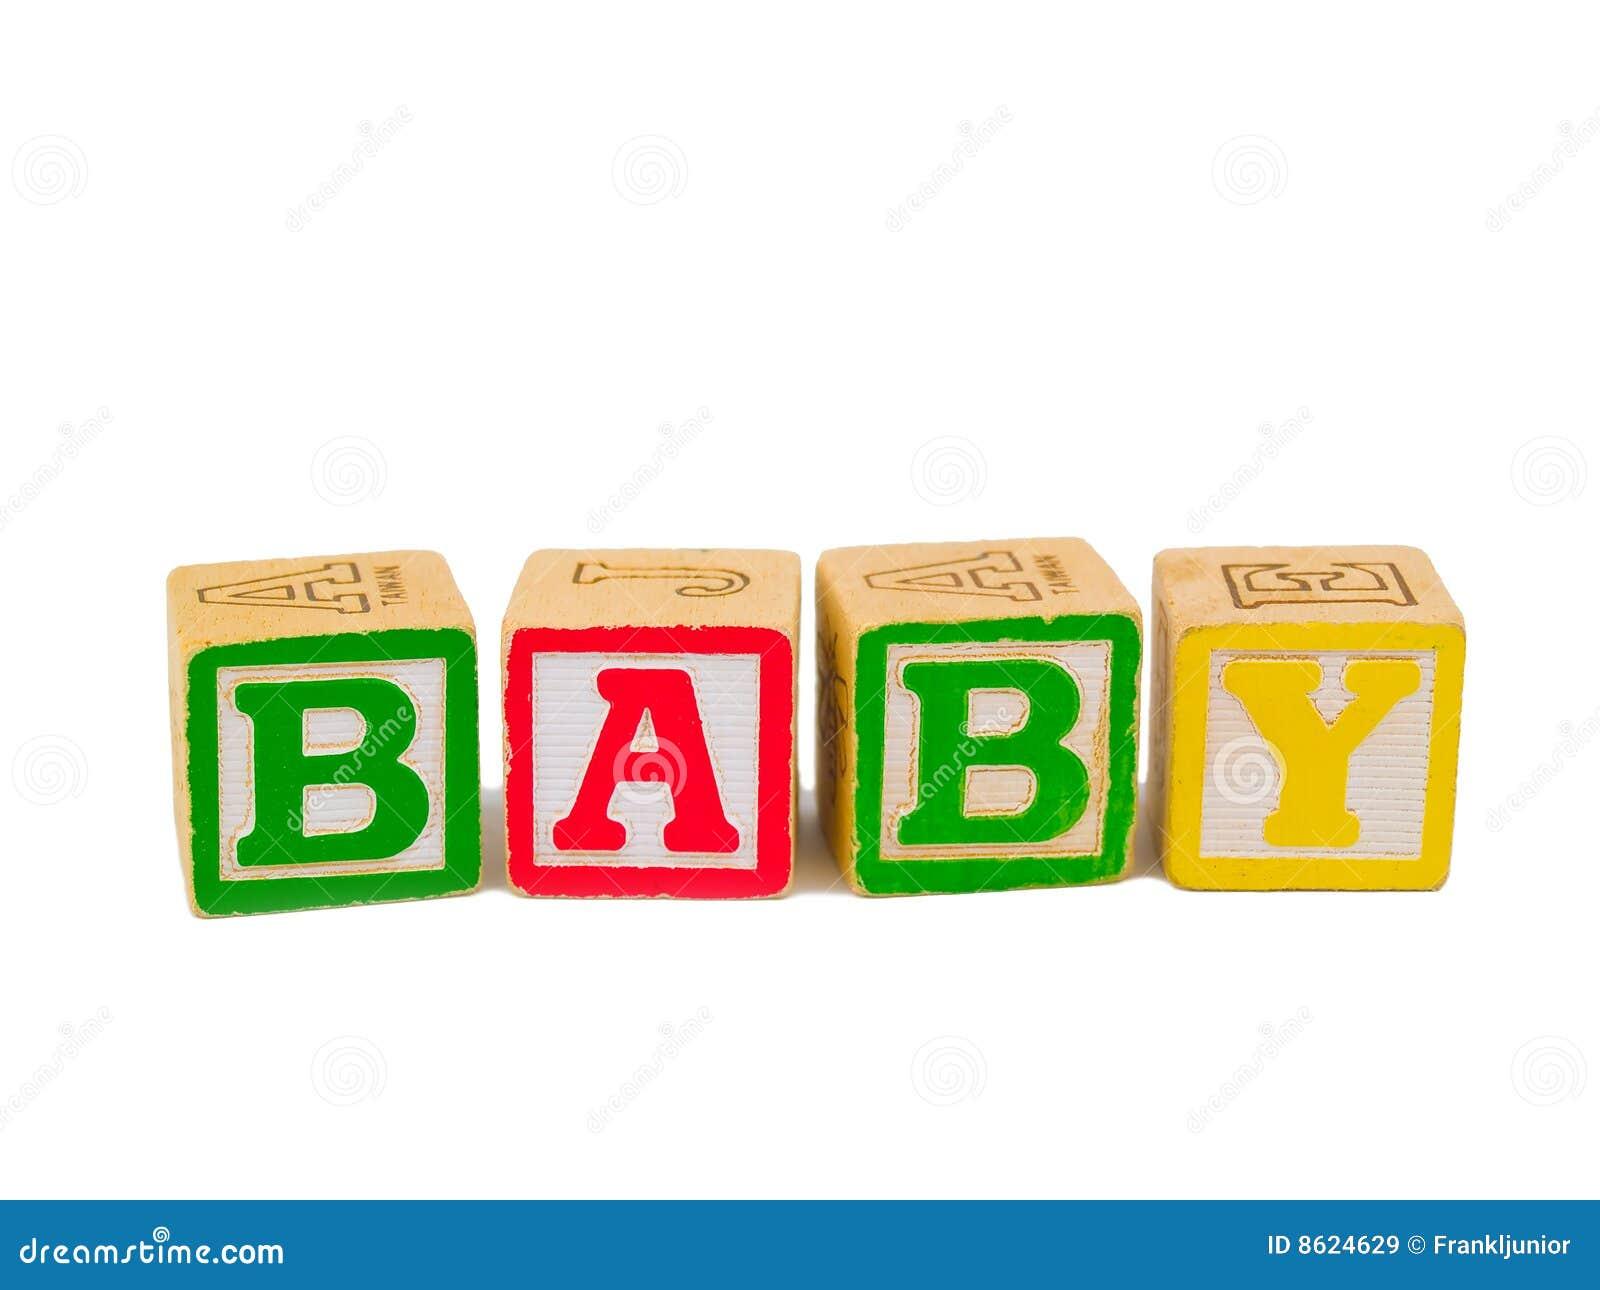 Abc Blocks Abc blocks spelling baby